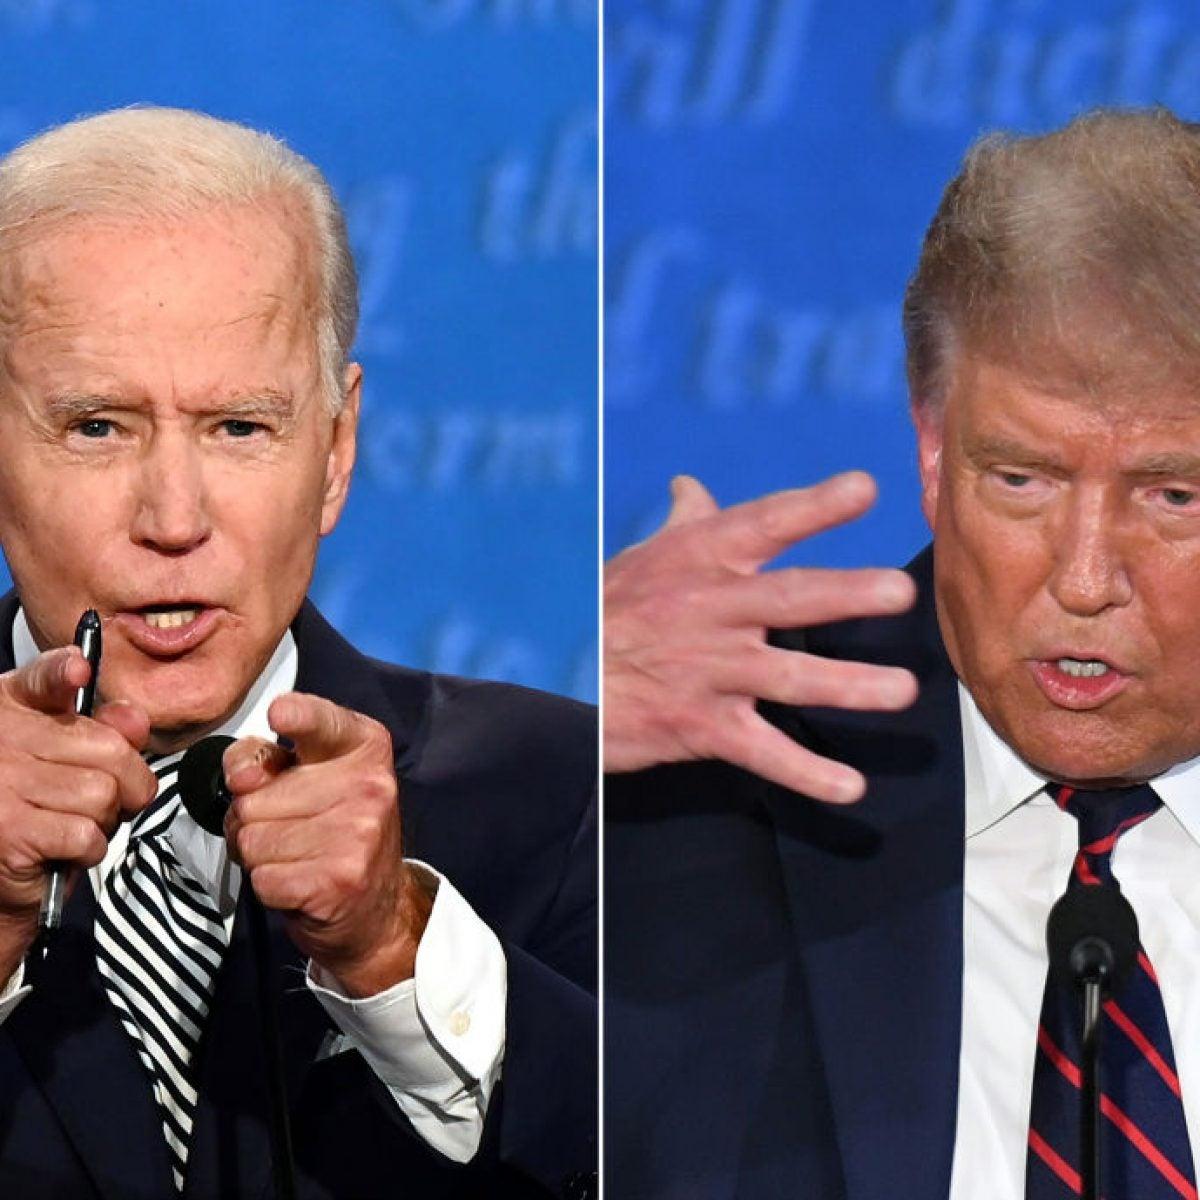 #BoycottNBC: Network Pits Trump Town Hall Against Biden's On ABC